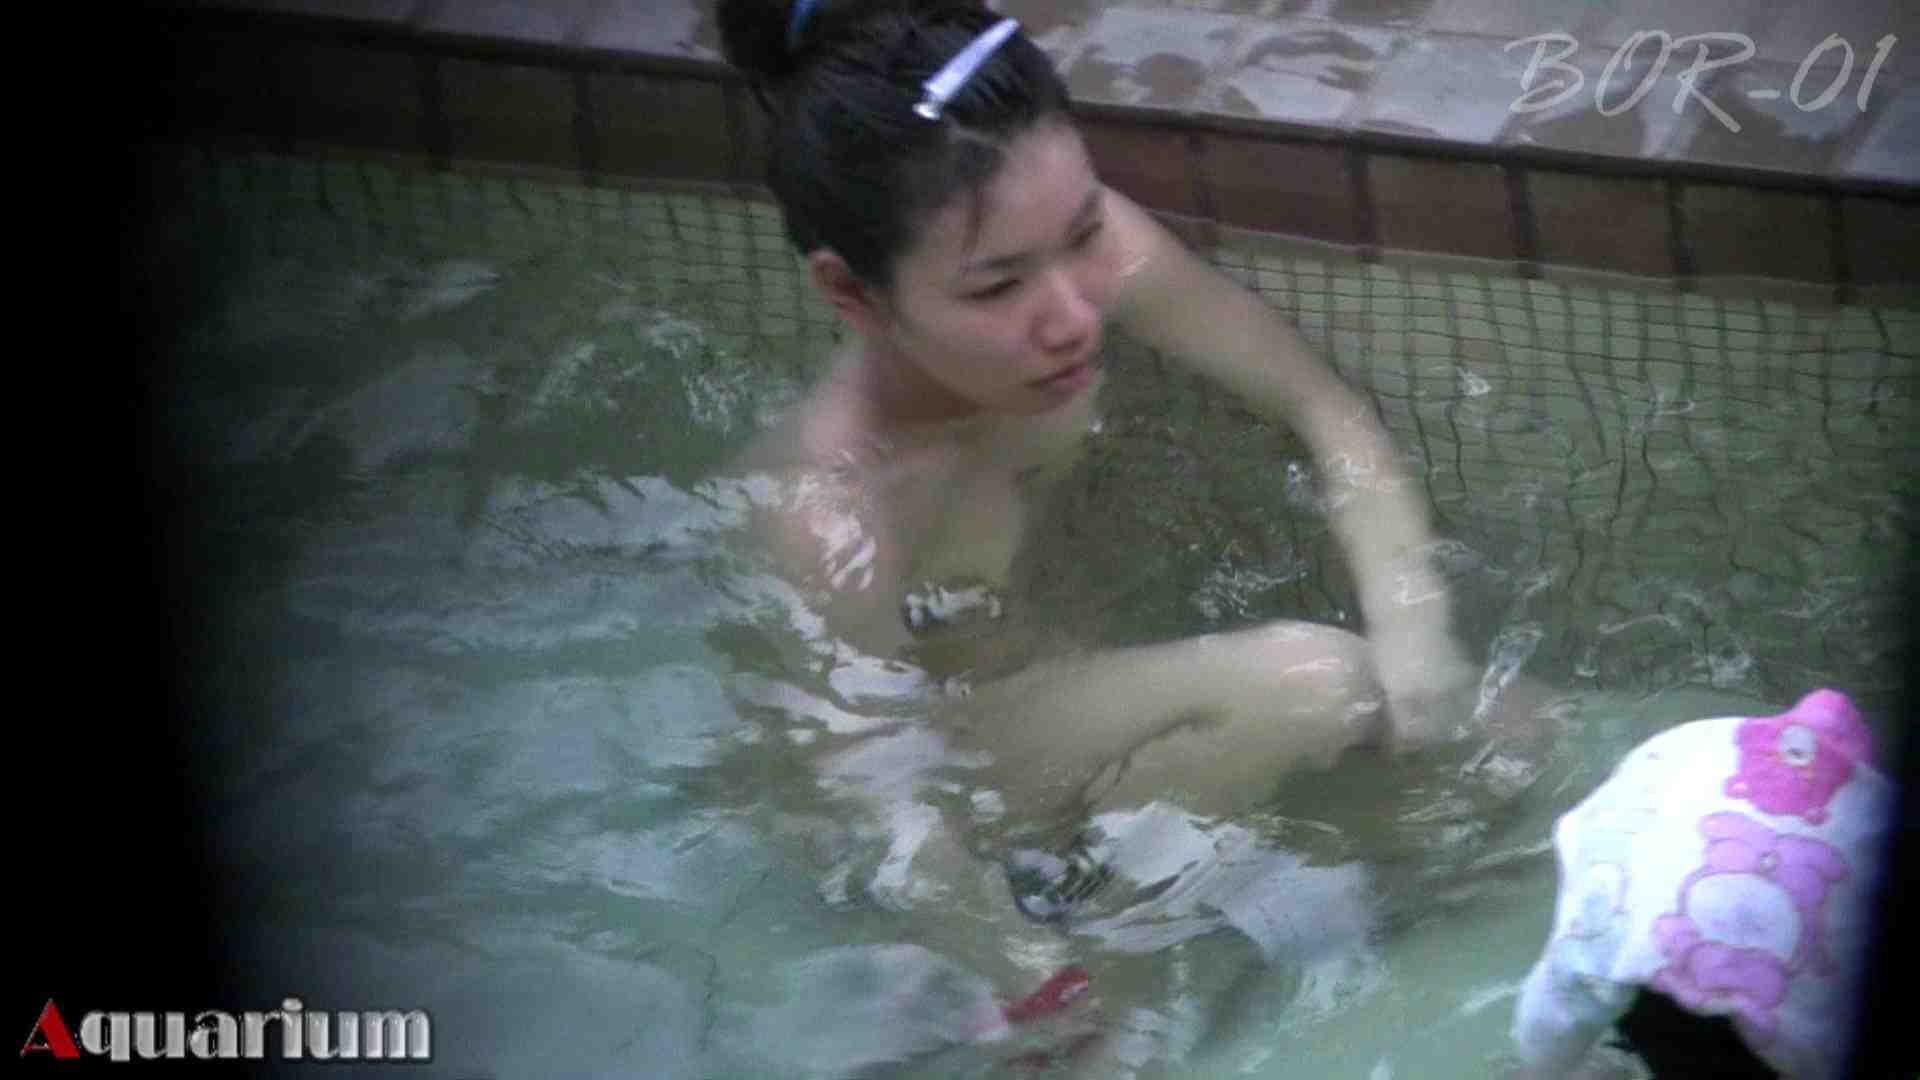 Aquaな露天風呂Vol.457 OLのプライベート   盗撮特撮  13pic 10